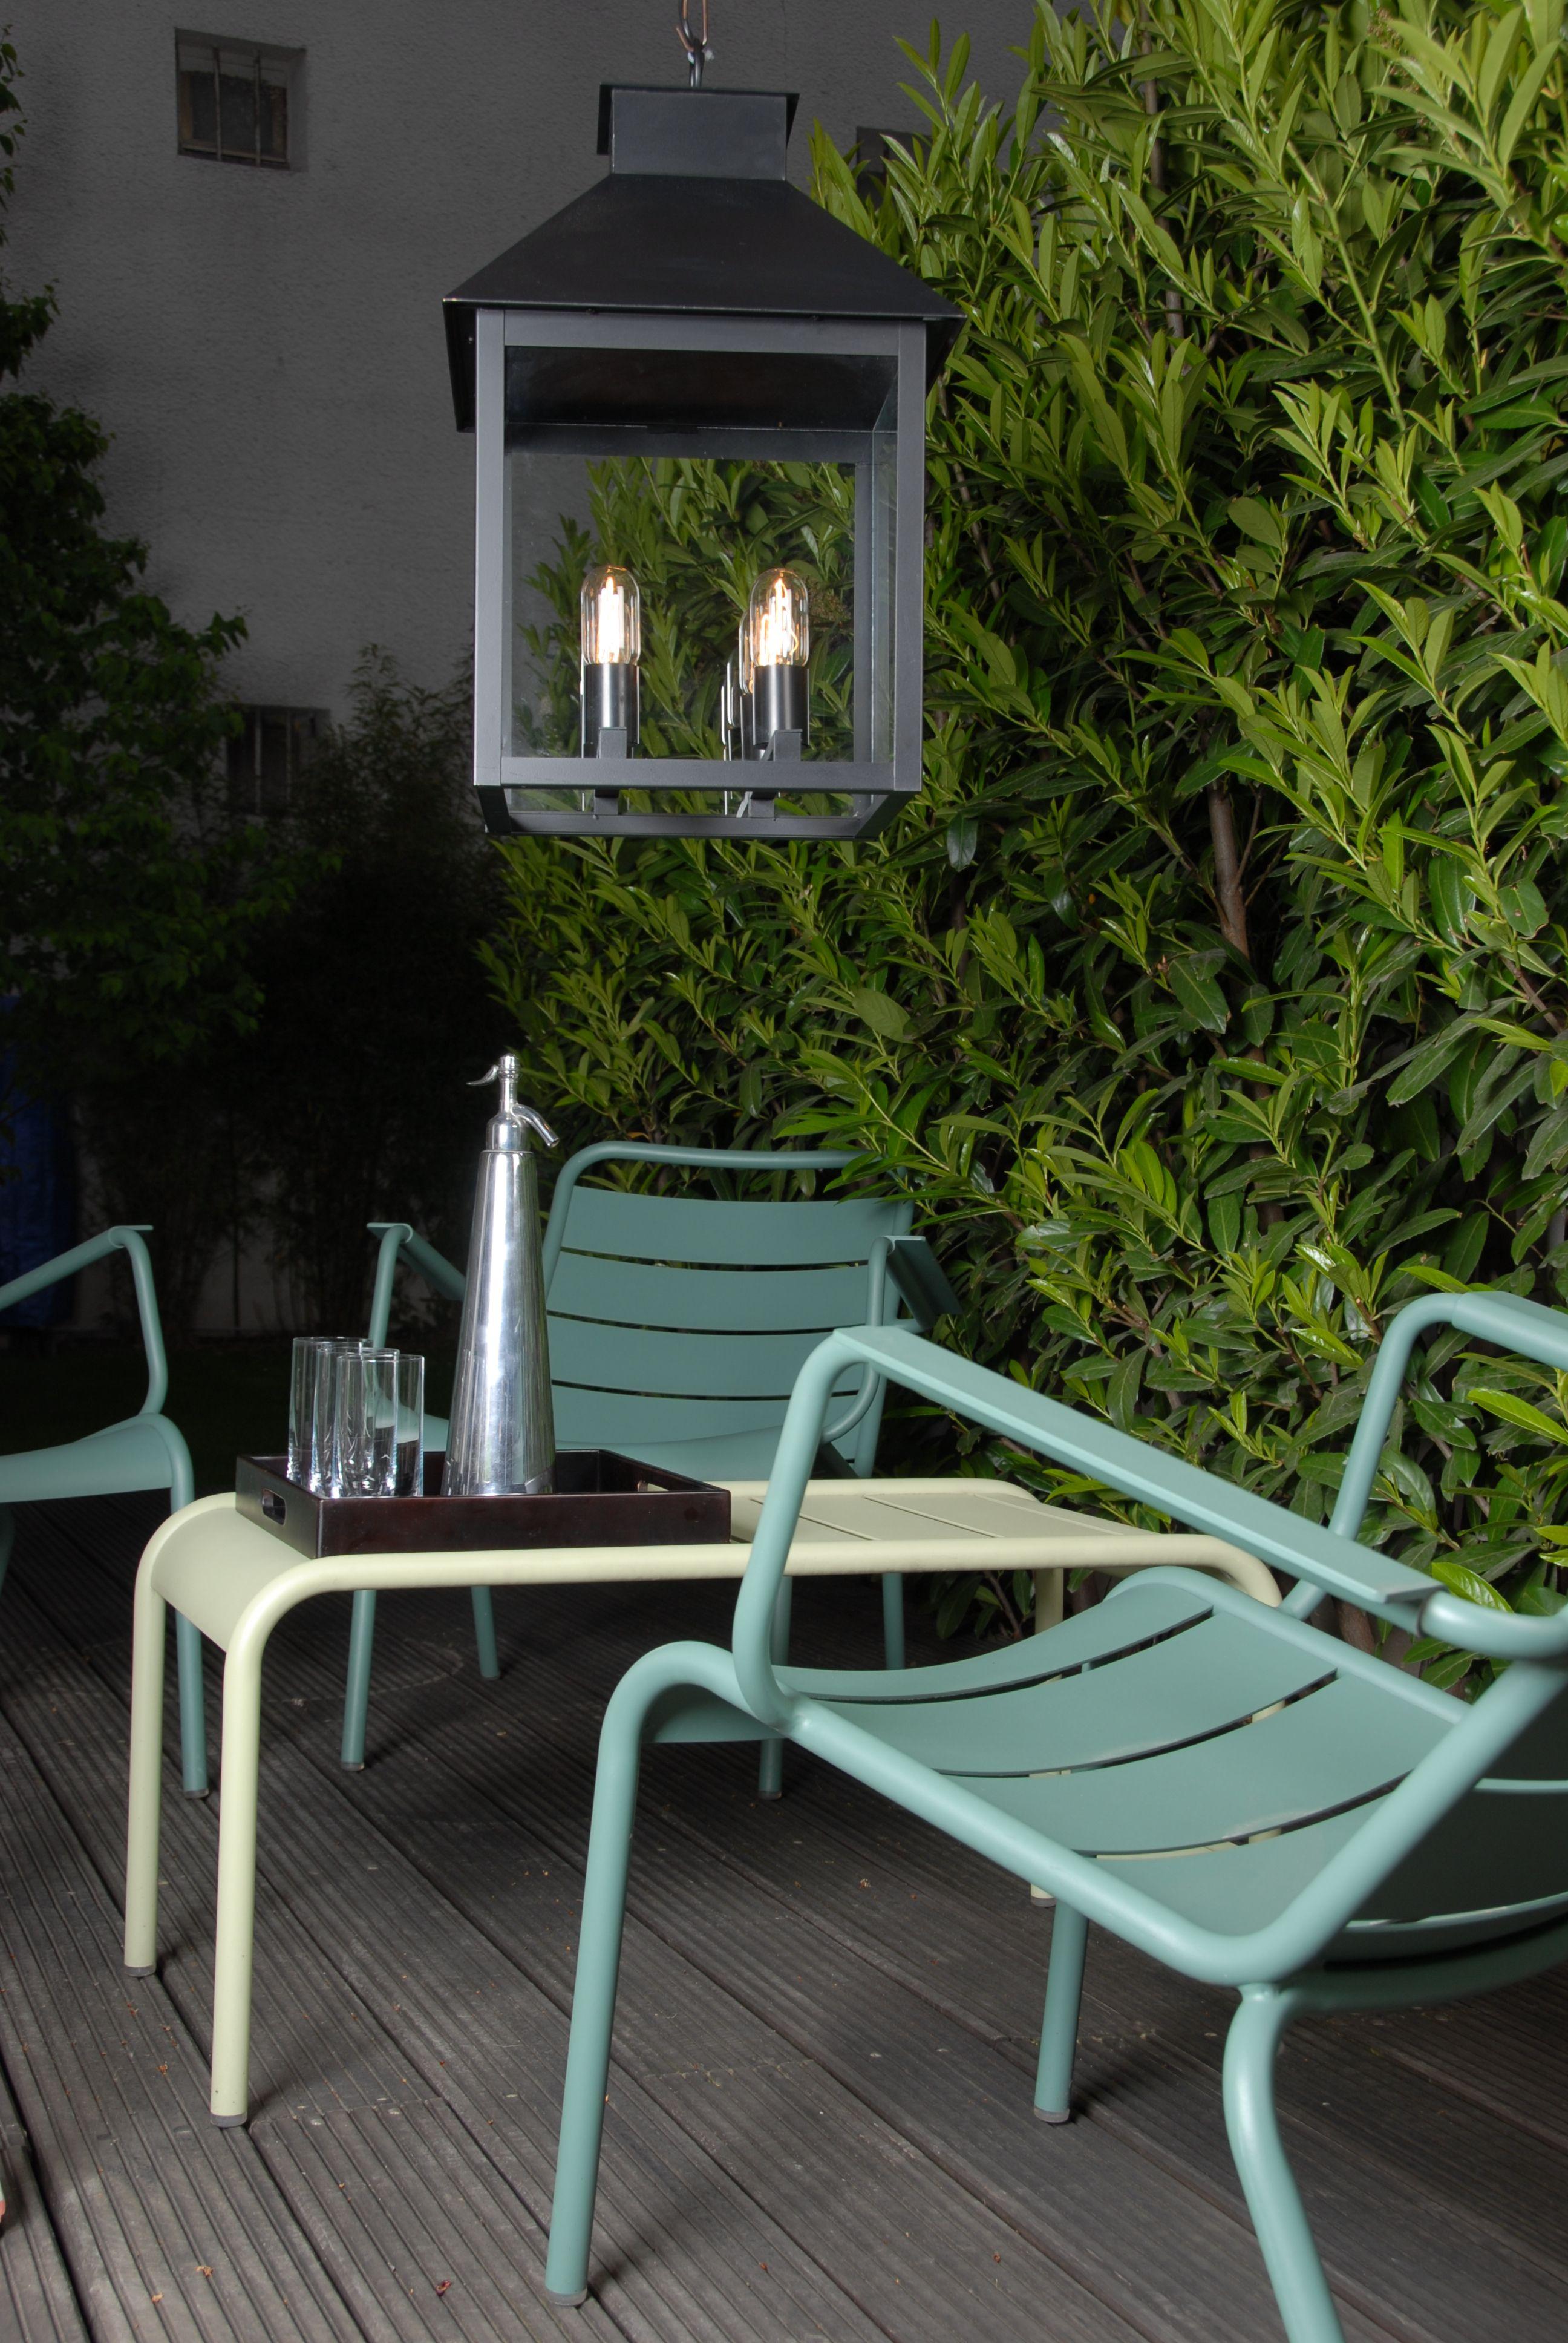 antana lumart outdoor lantern lanterne de jardin - Lanterne De Jardin